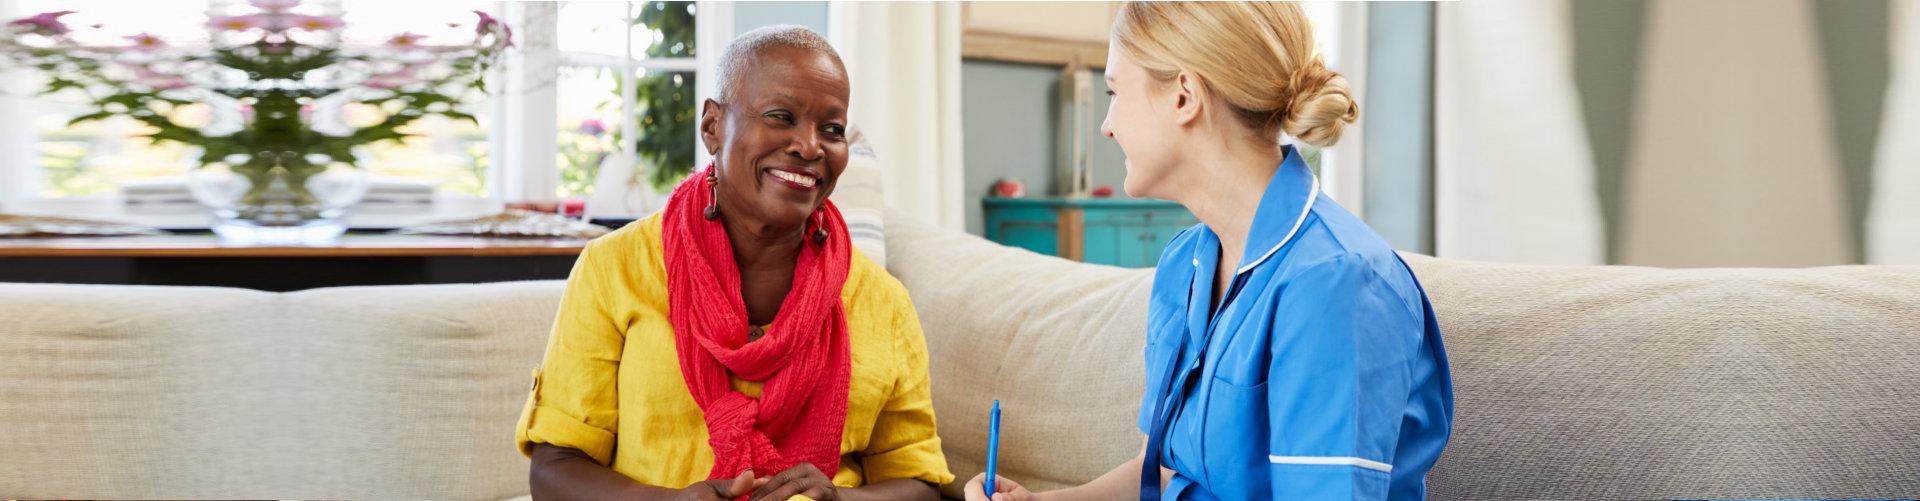 caregiver talking to a senior woman